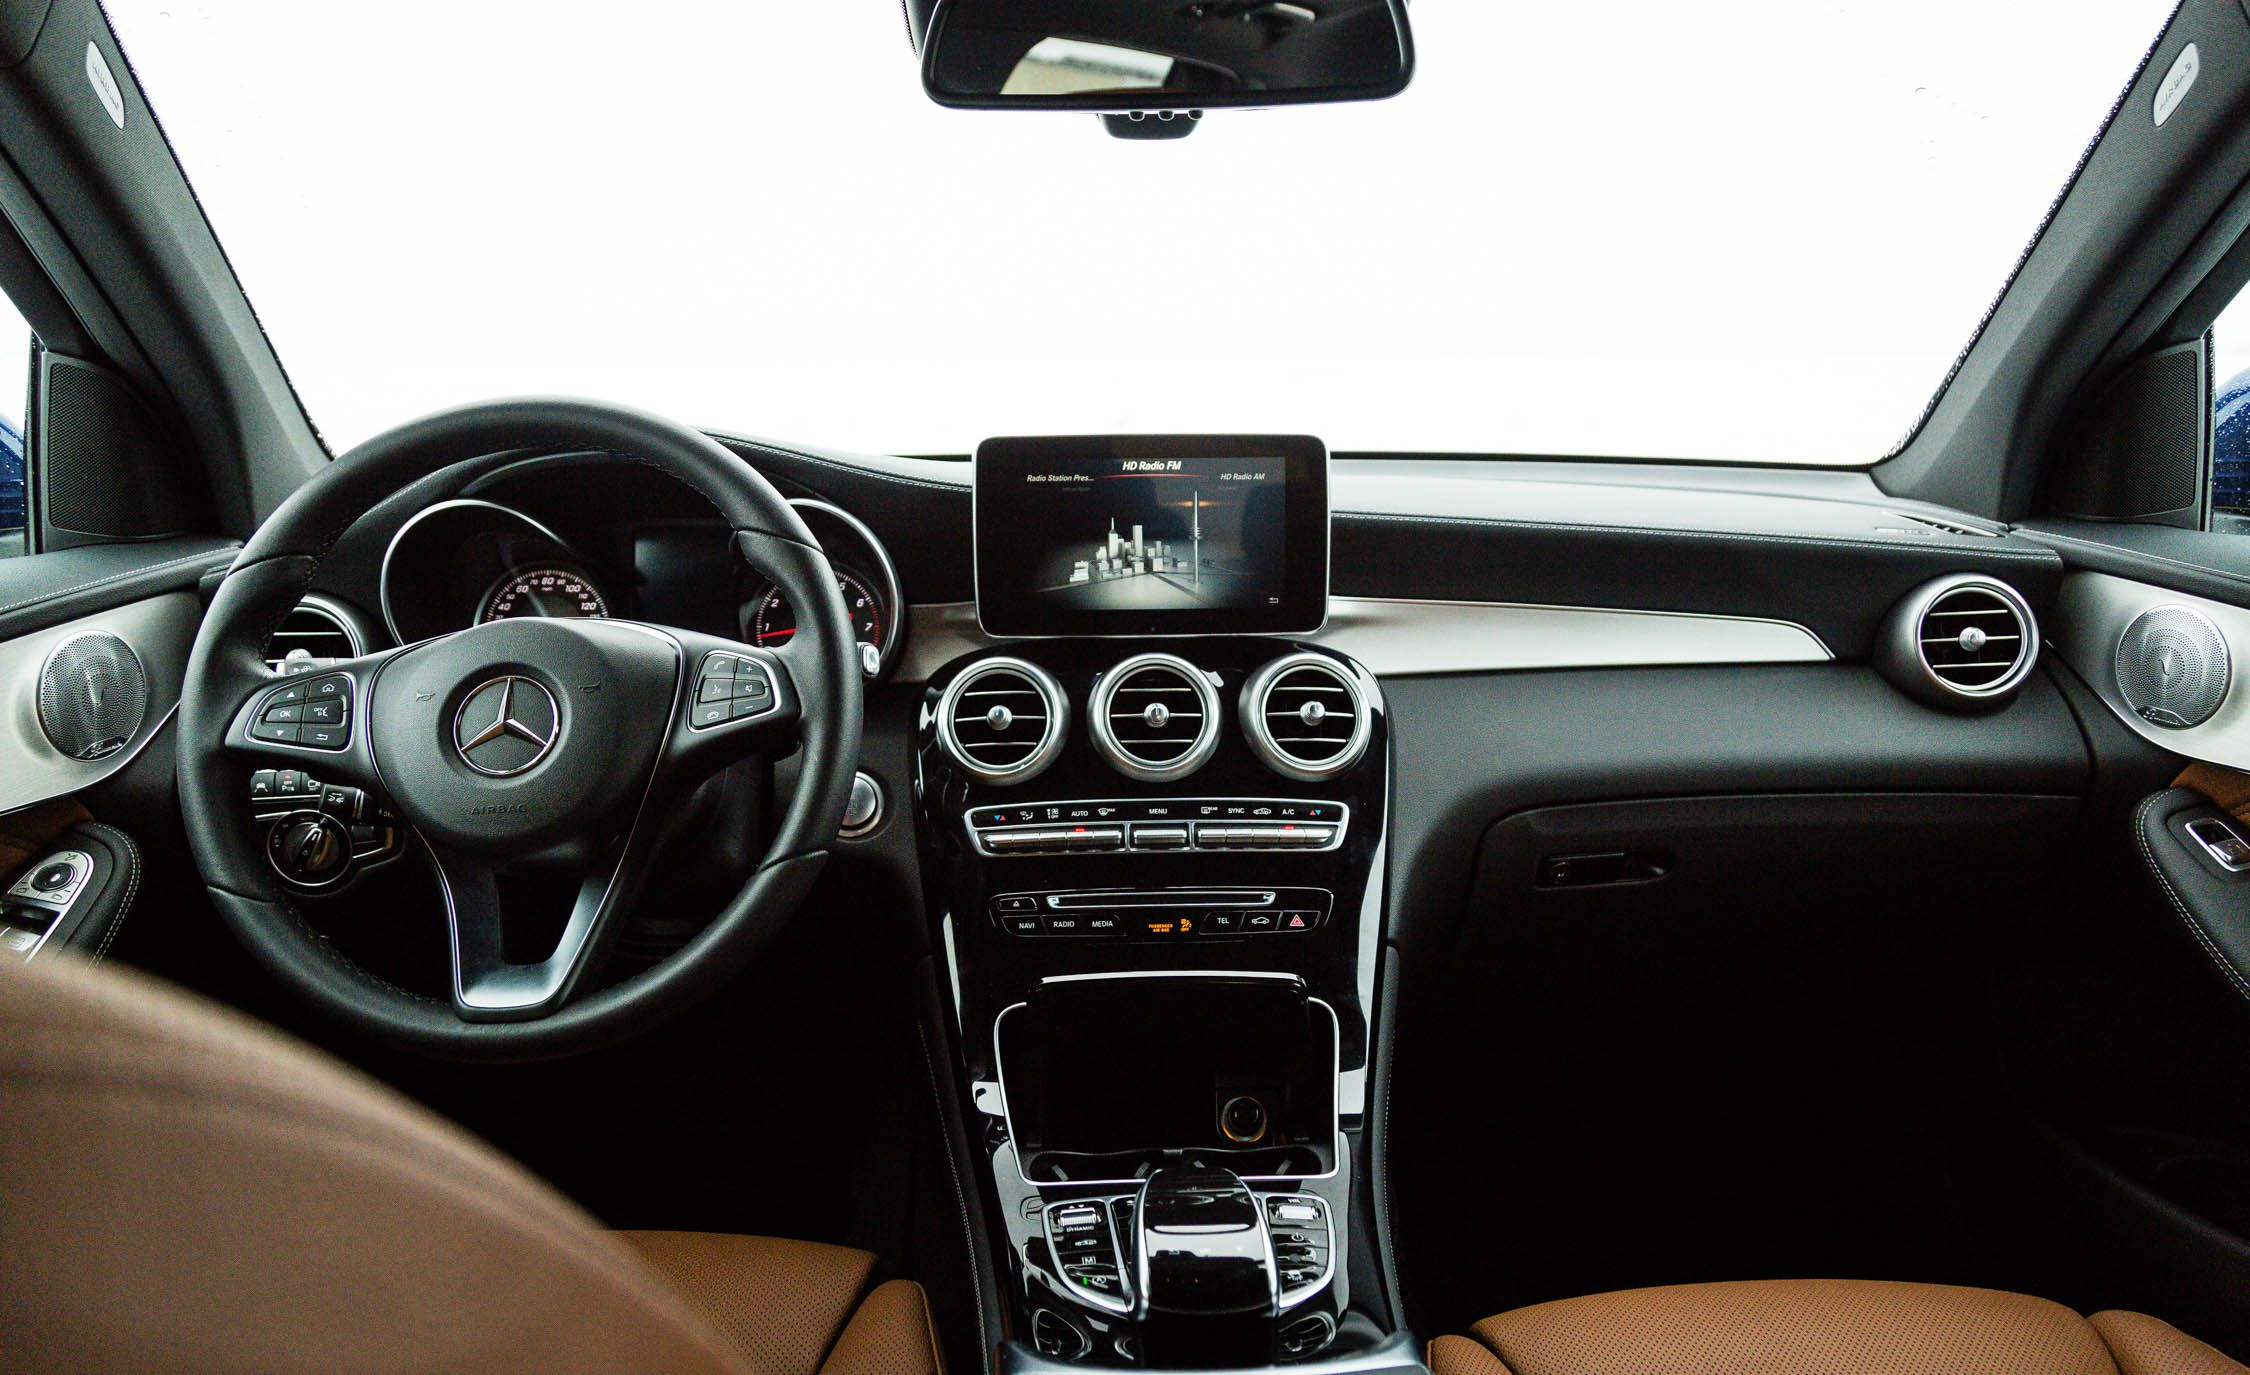 2020 Mercedes Benz Glc Cl Reviews Price Photos And Specs Car Driver